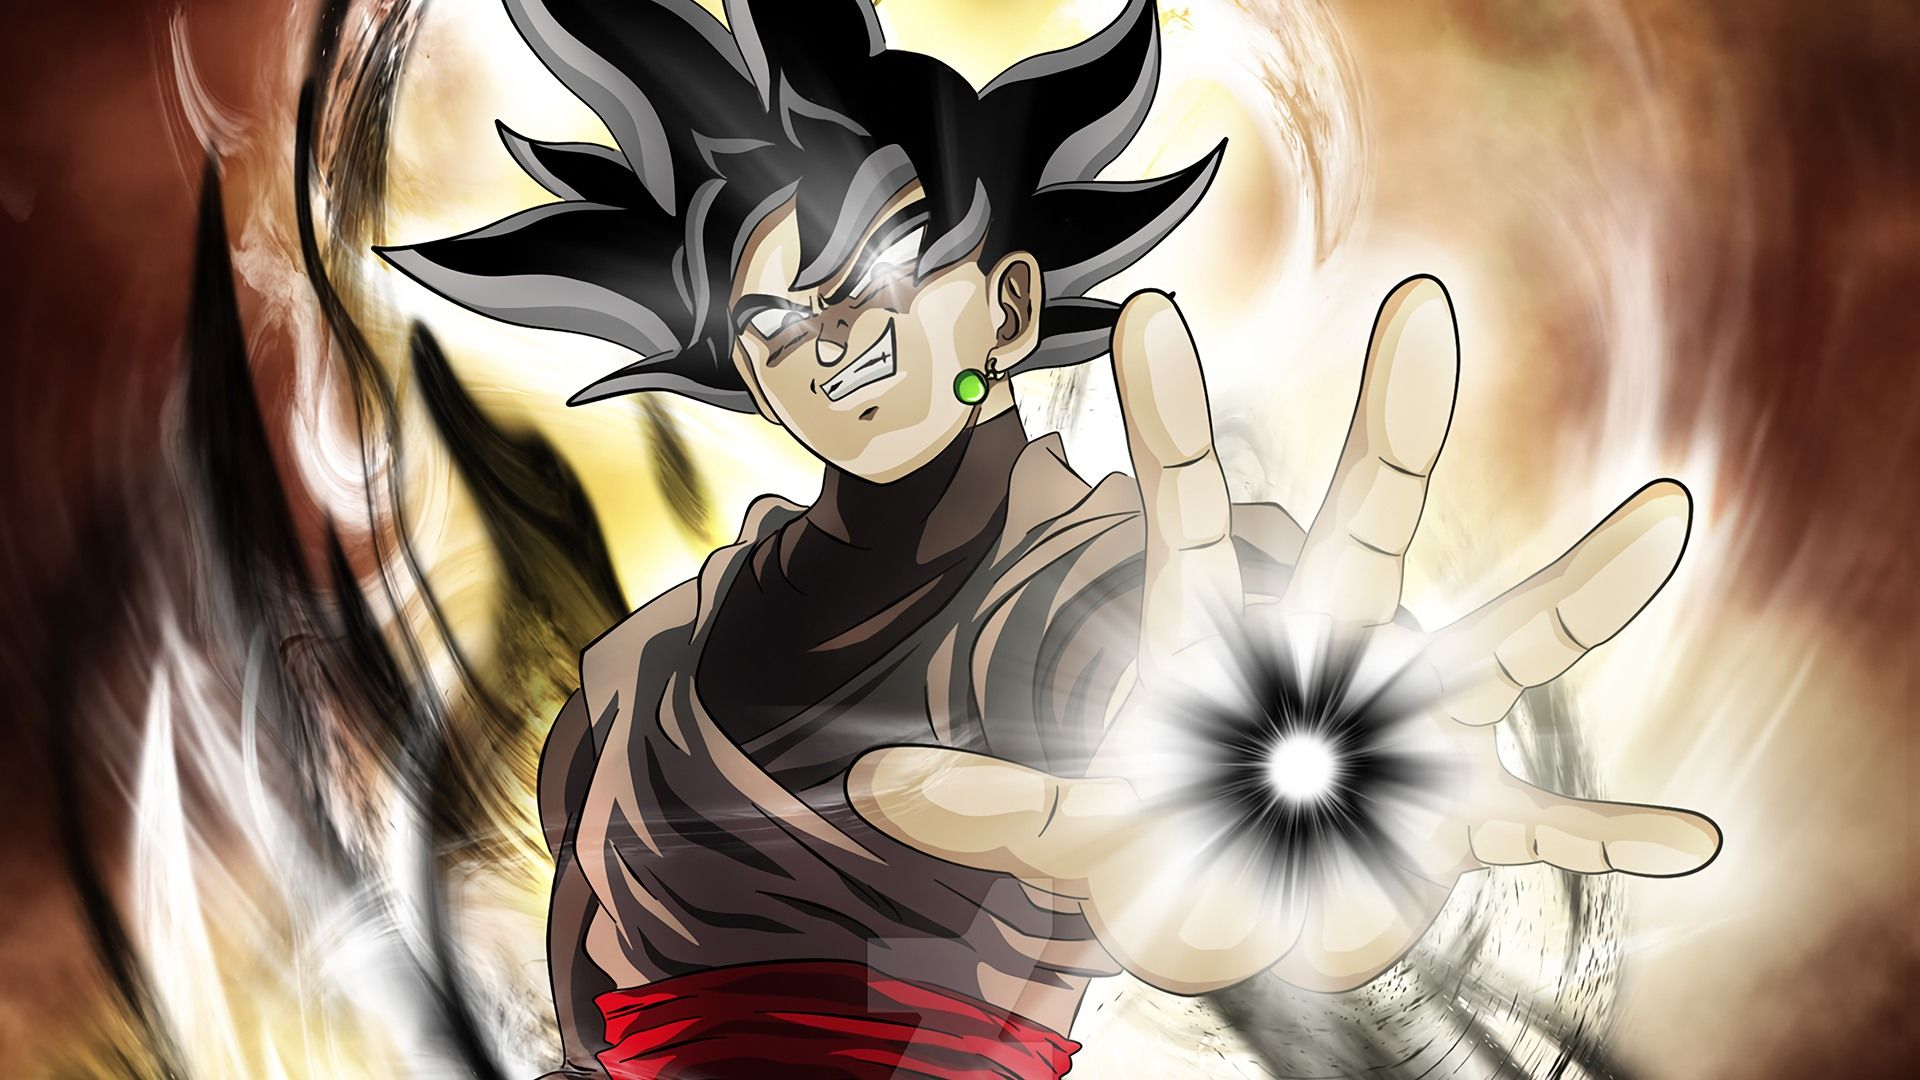 Black Goku Wallpapers Hd Goku Wallpaper Black Dragon Goku